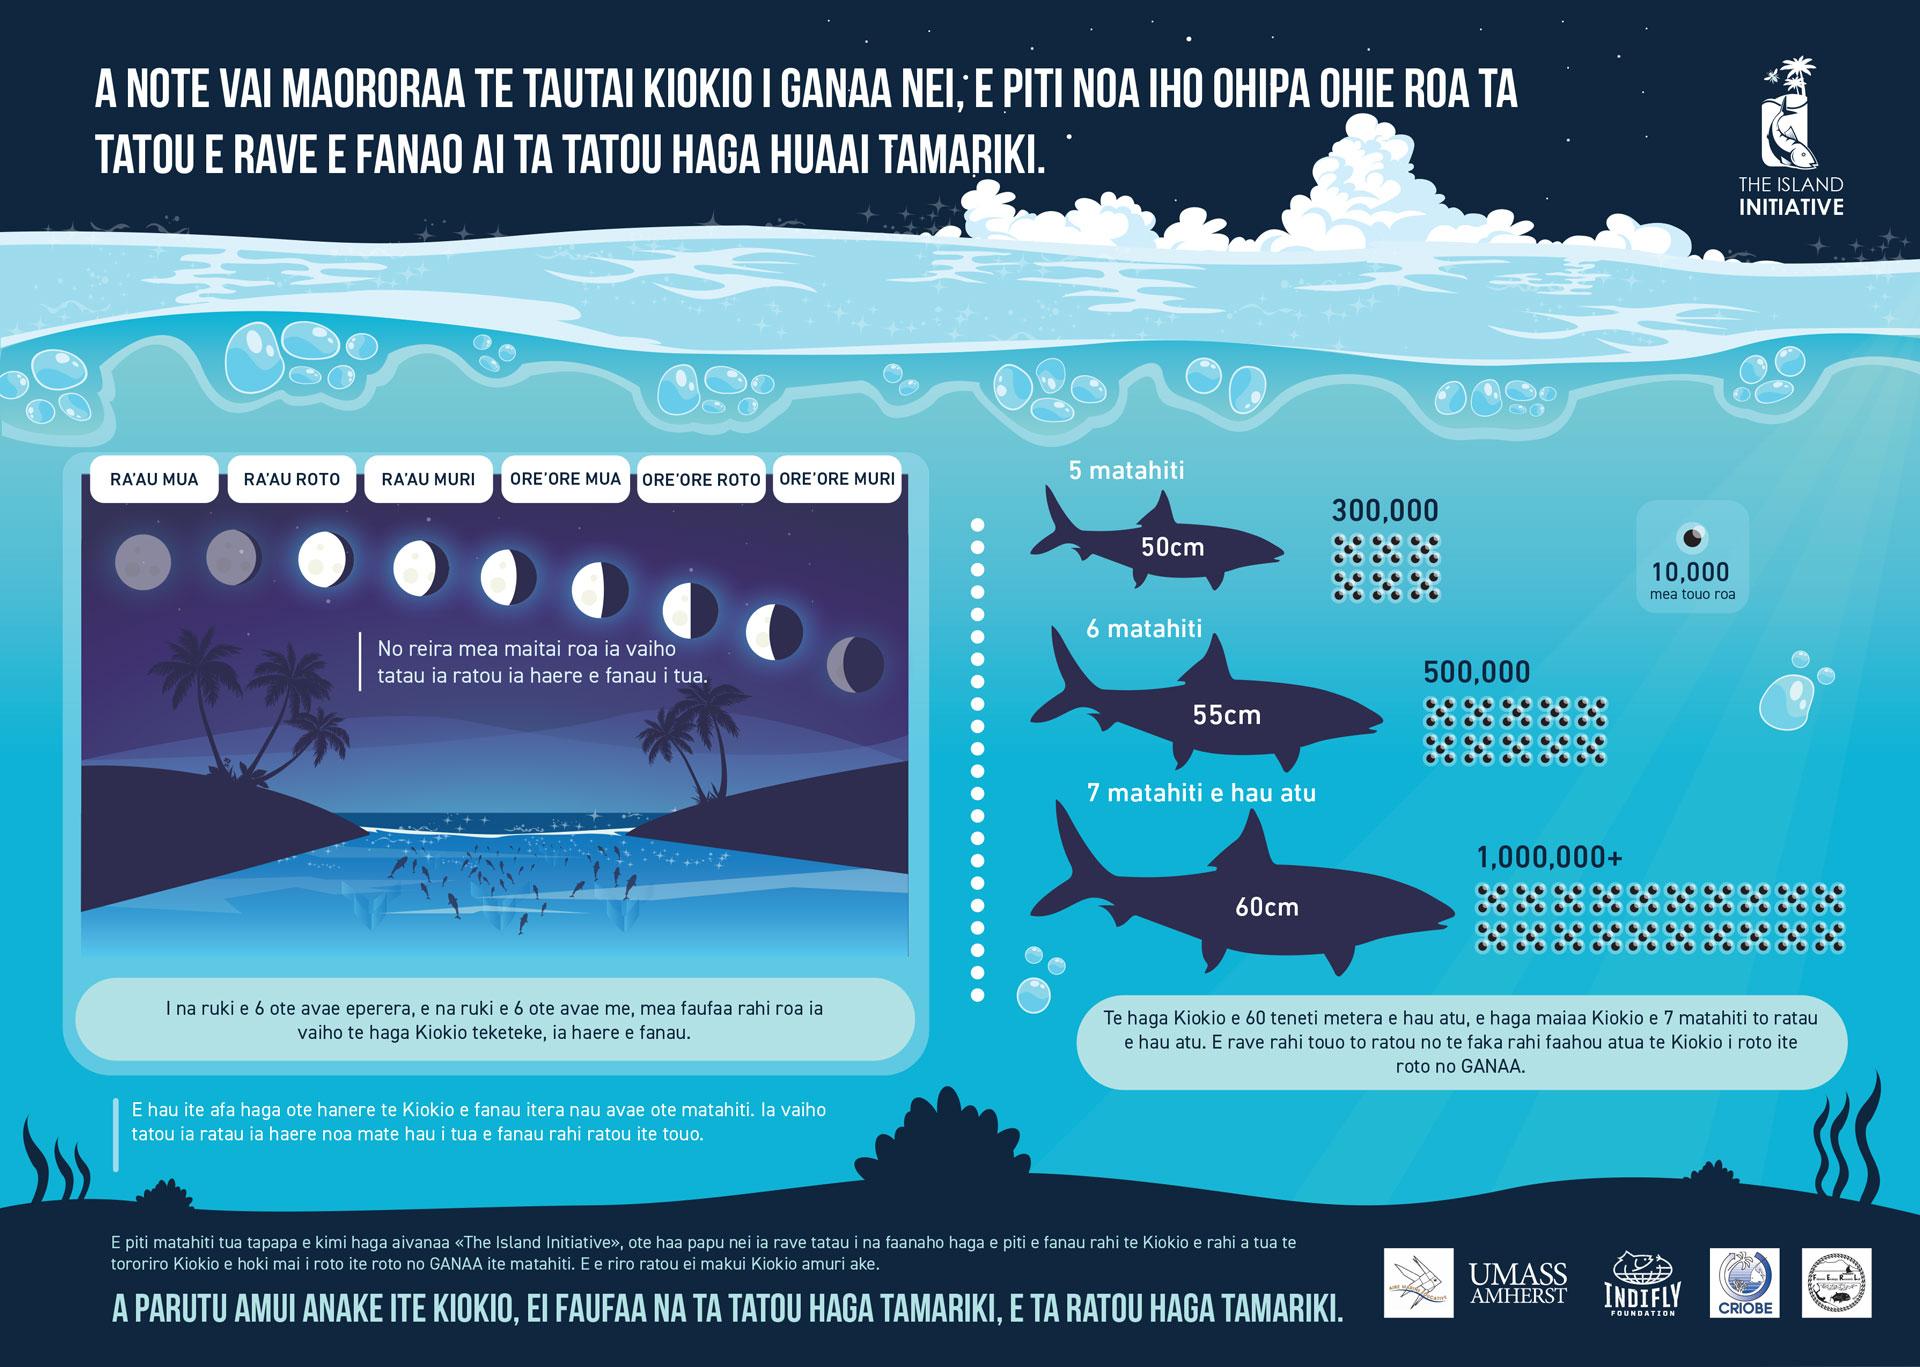 Anaa Atoll Infographic in paumotu